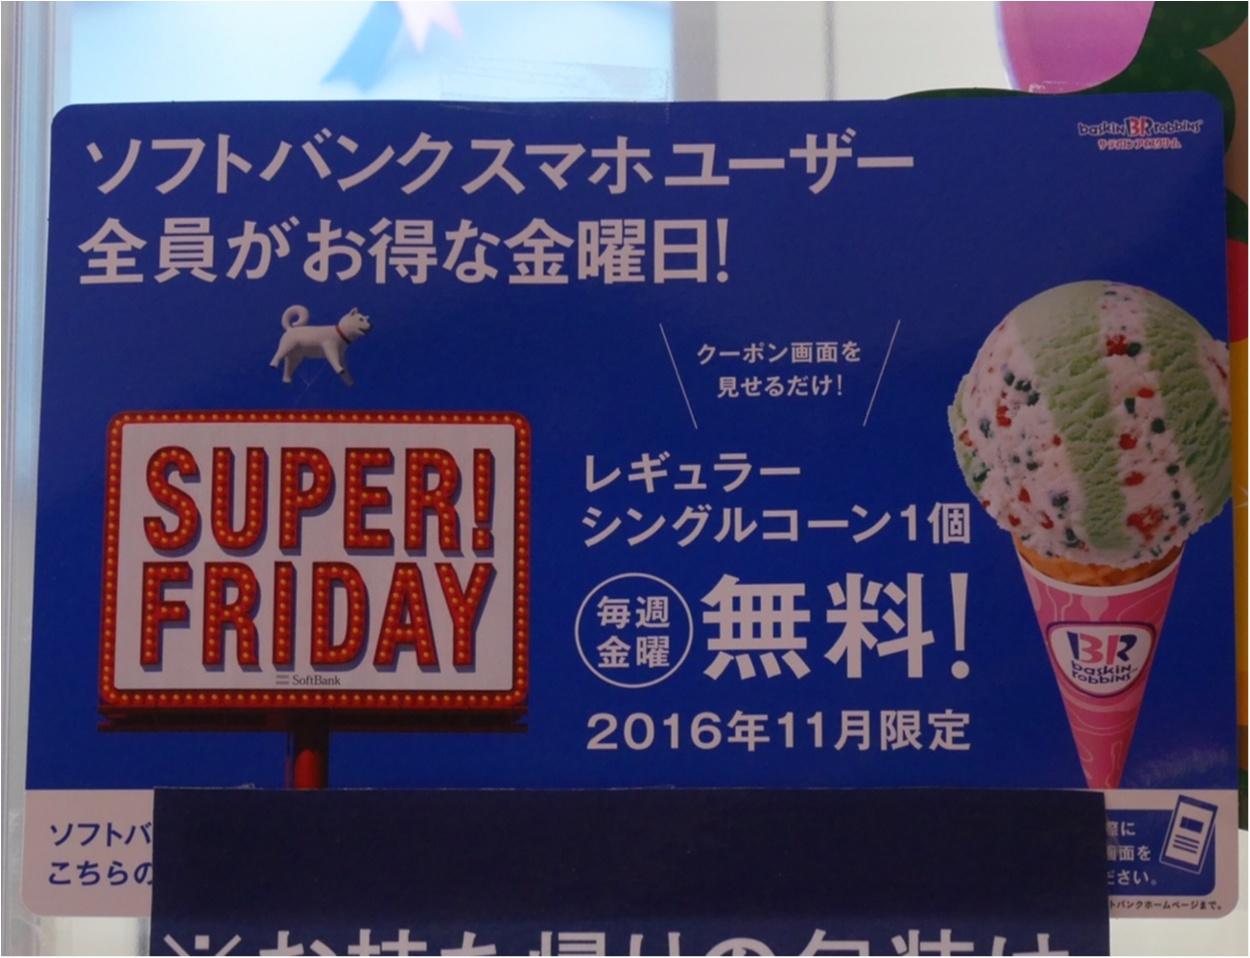 SUPER FRIDAY!!!☺︎ソフトバンクユーザーだけがもらえるお得なクーポン♡♡♡_2